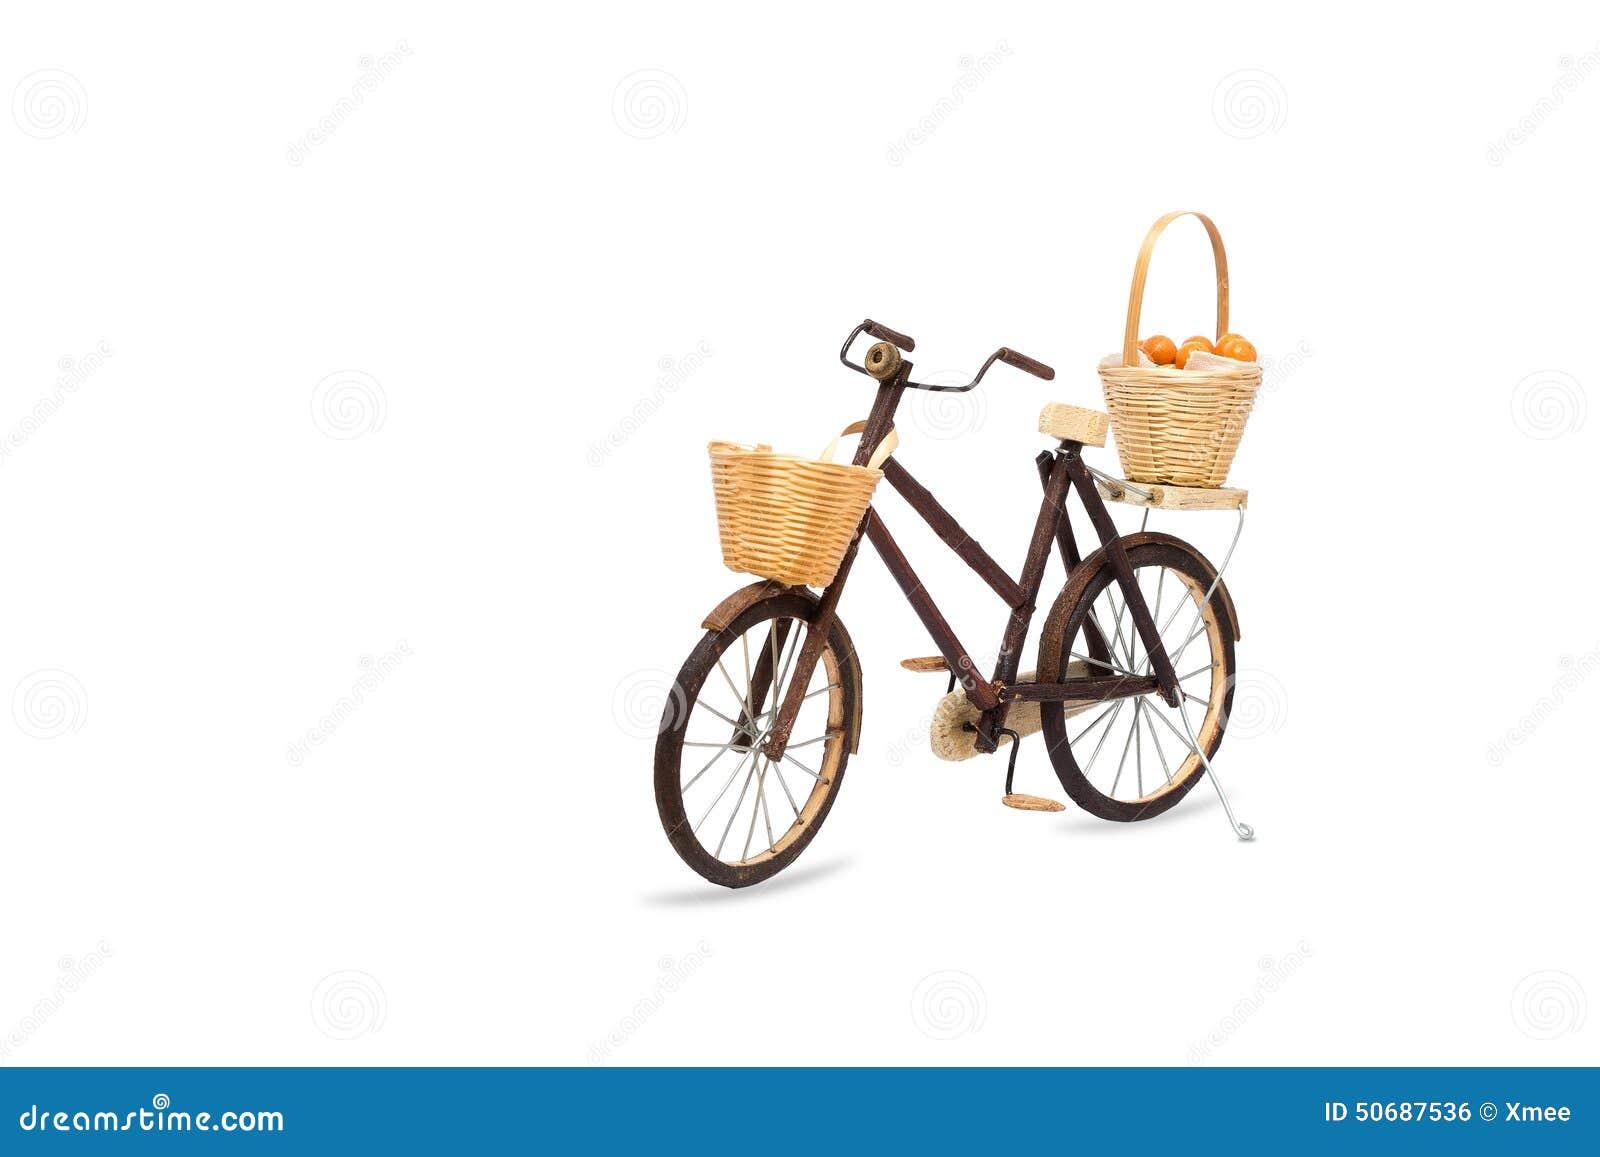 Download 木自行车玩具 库存照片. 图片 包括有 旅行, 查出, 剪报, 装饰, 骑自行车的人, 果子, 对象, 循环 - 50687536